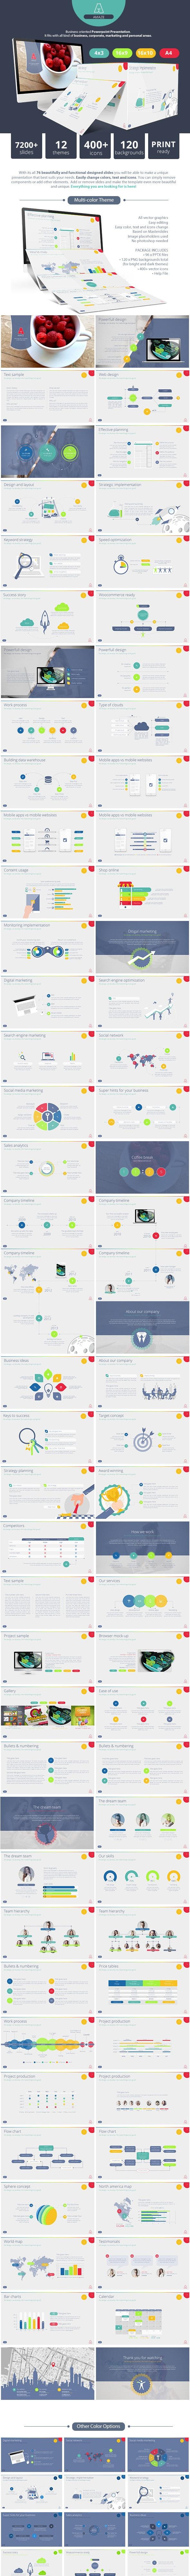 Amaze Powerpoint Presentation - PowerPoint Templates Presentation Templates